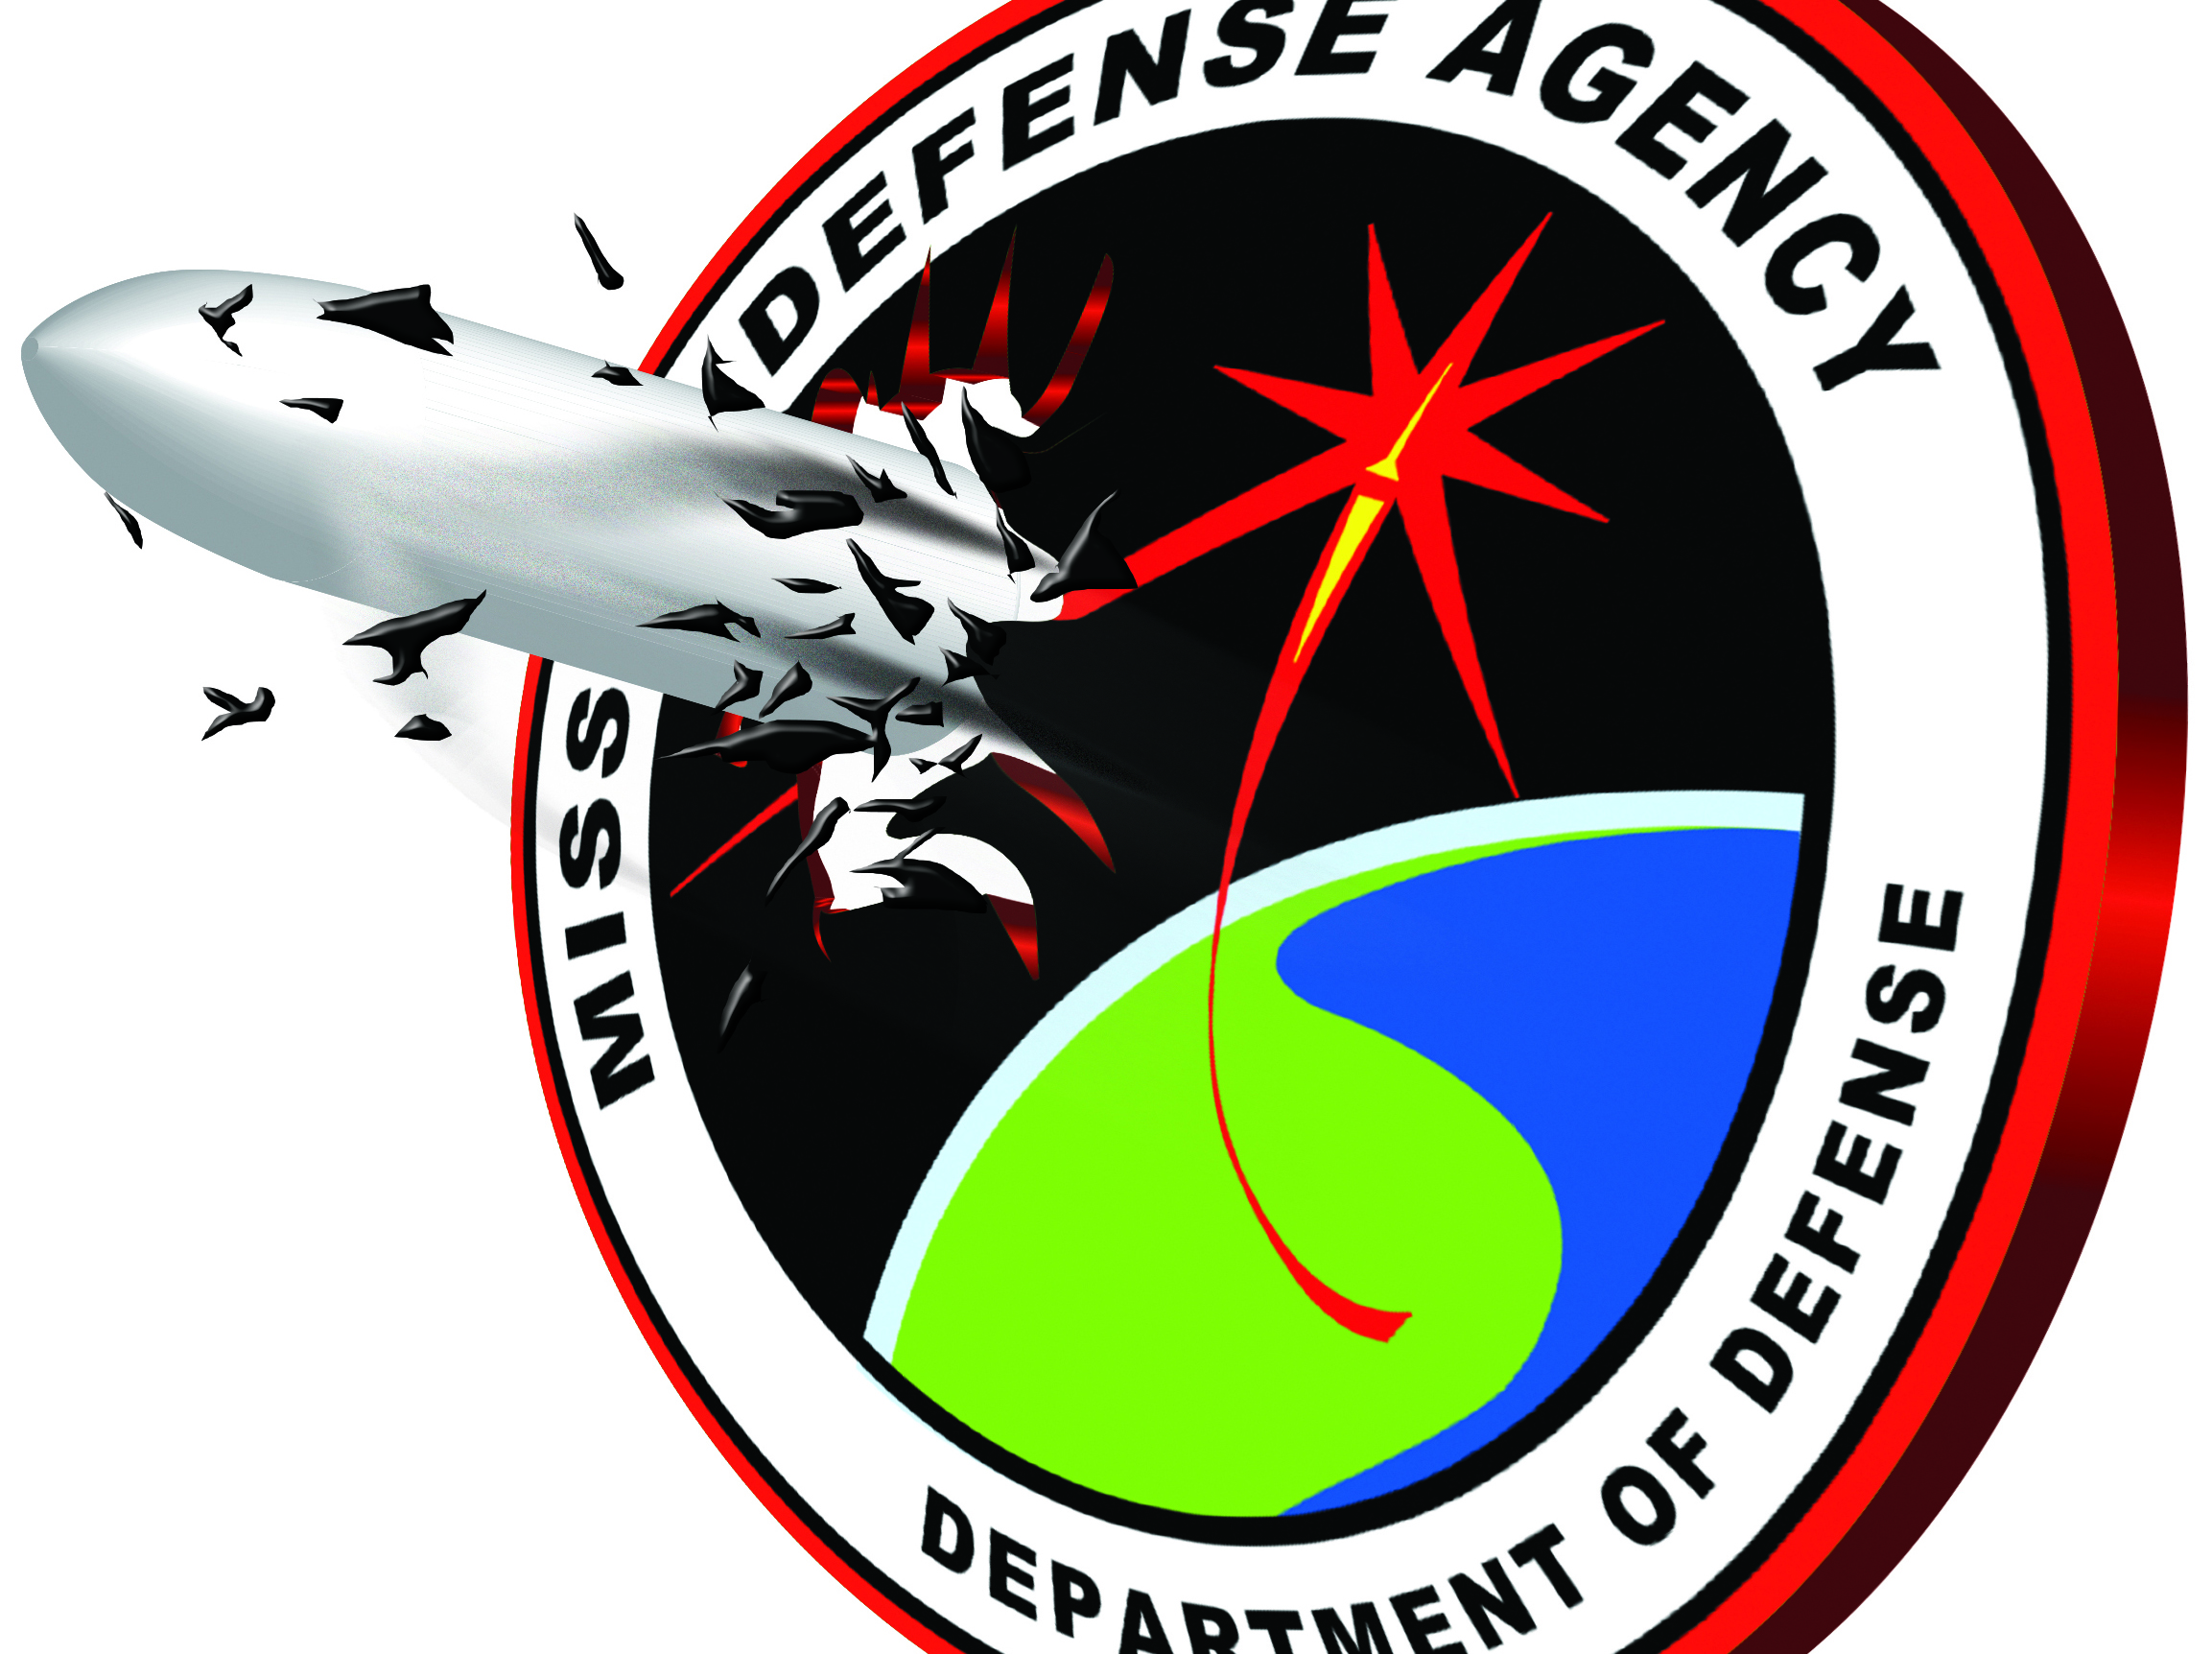 by SpaceNews Staff — November 22, 2014